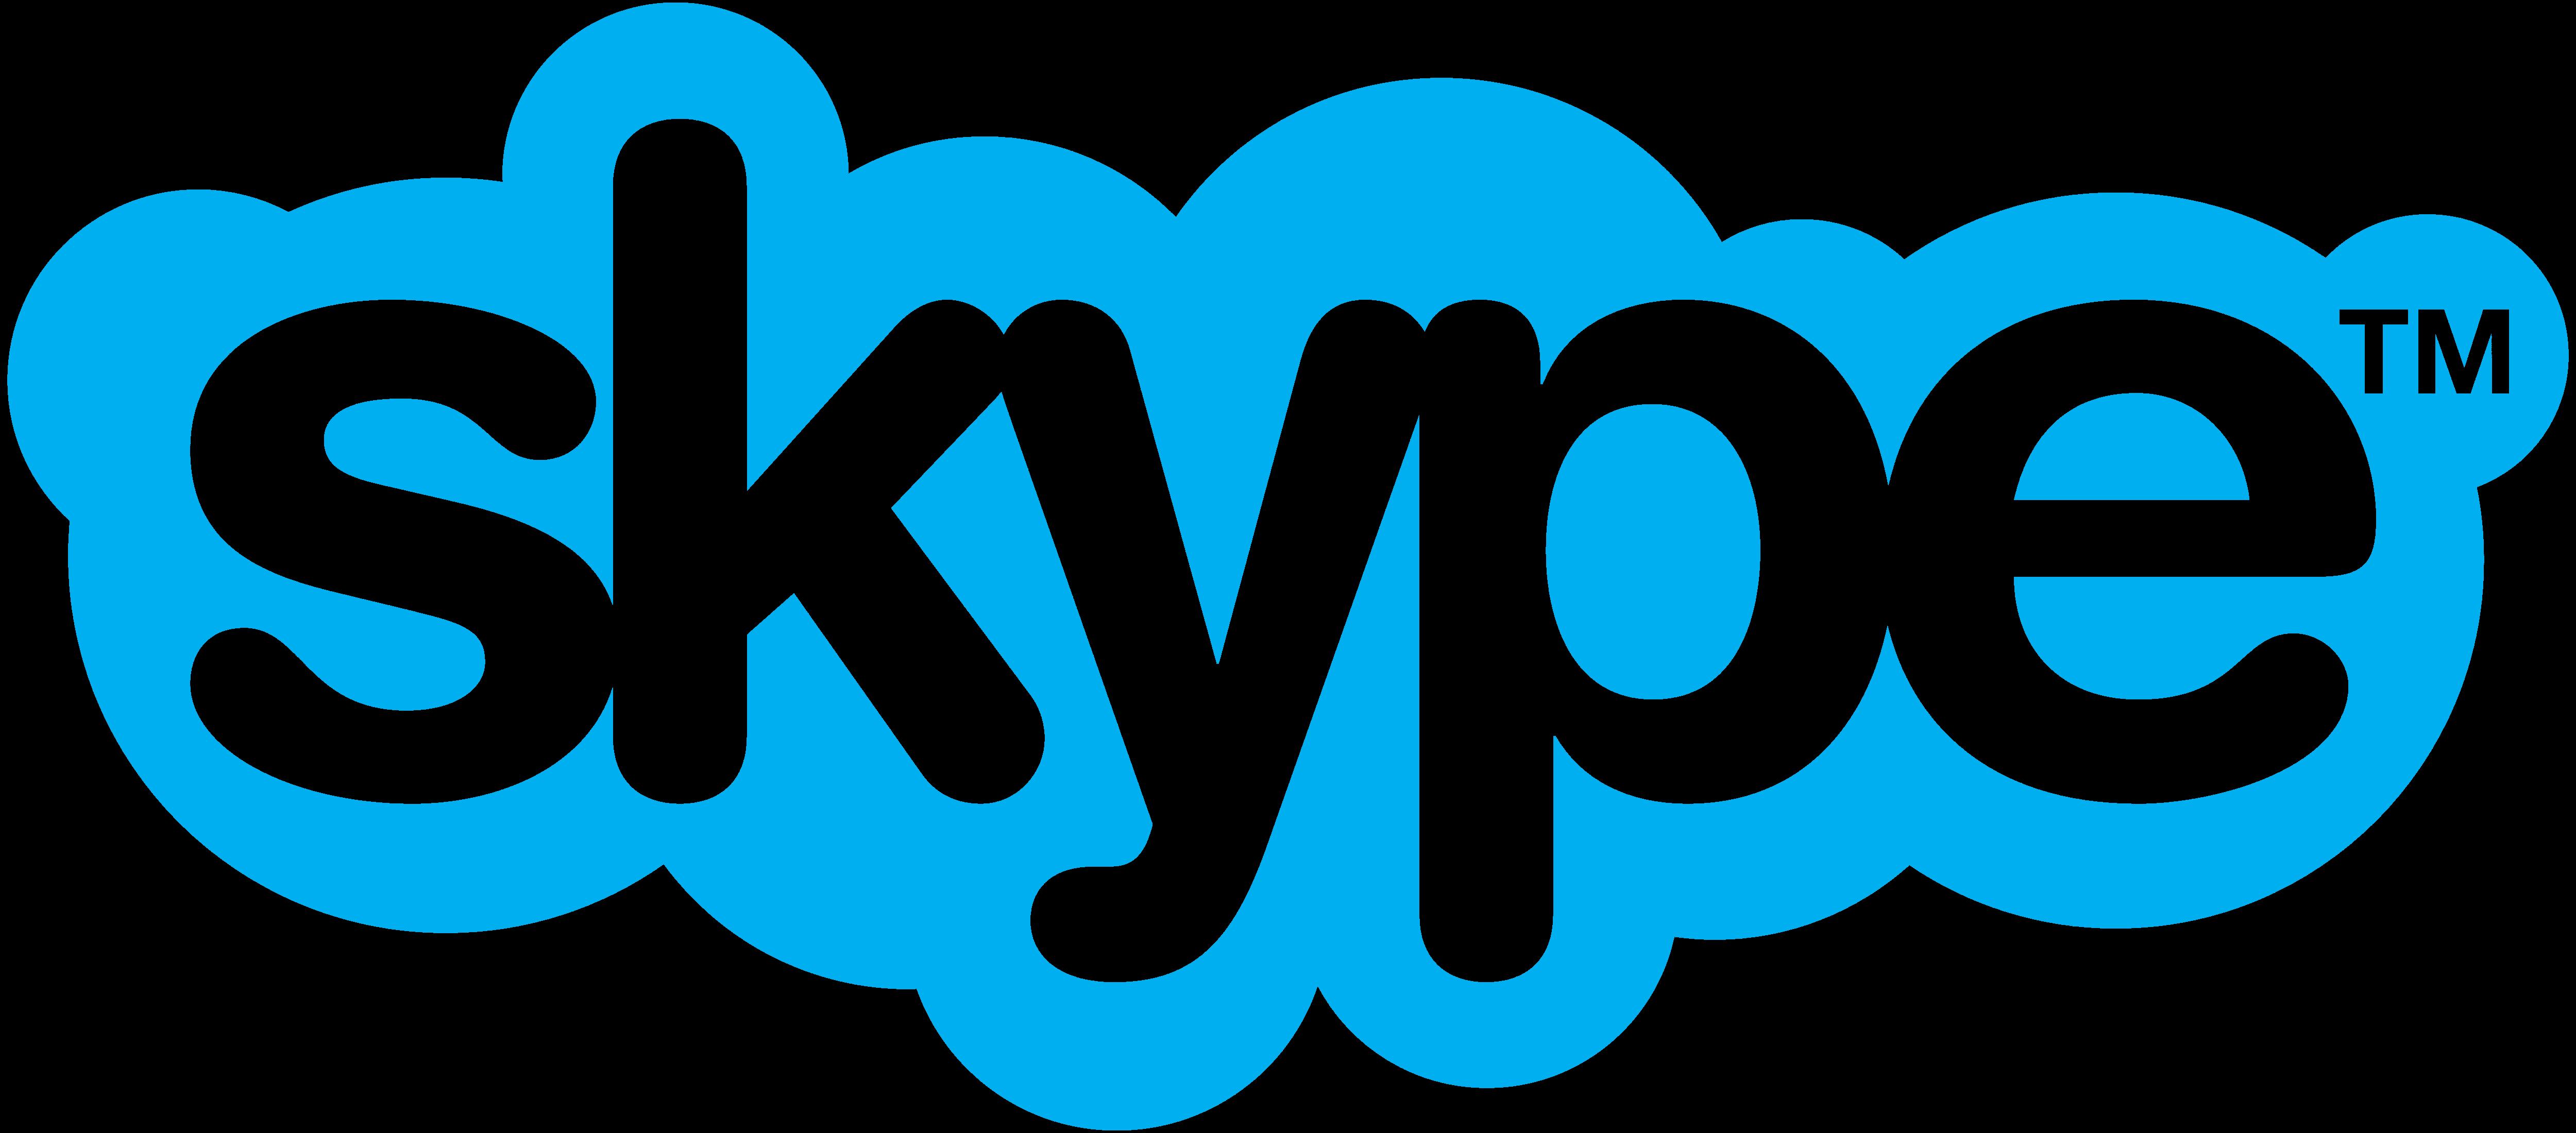 how to create a new skype